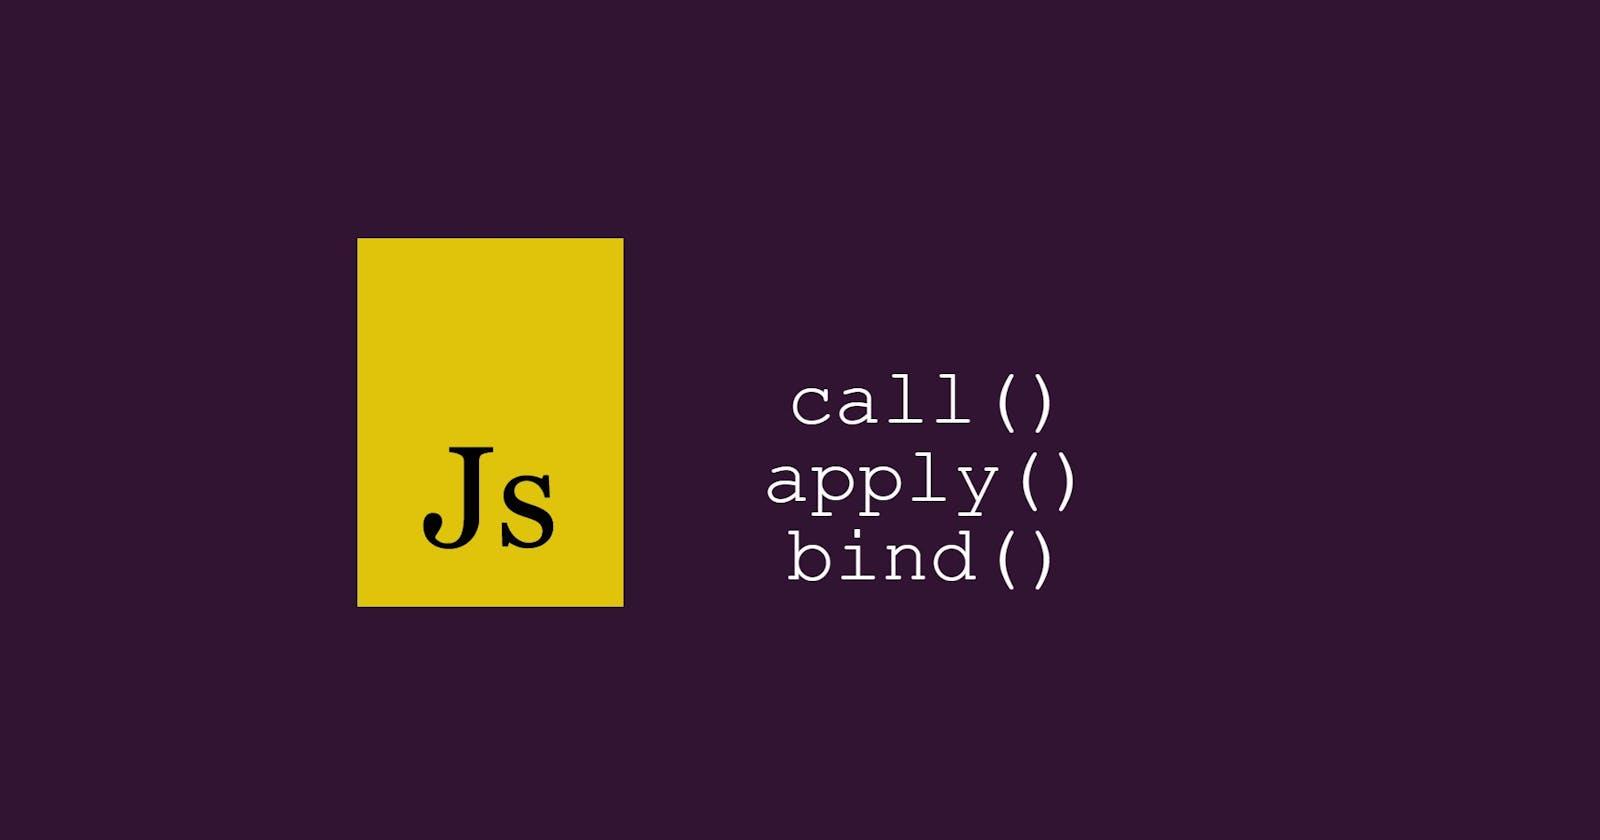 call(), apply(), and bind()